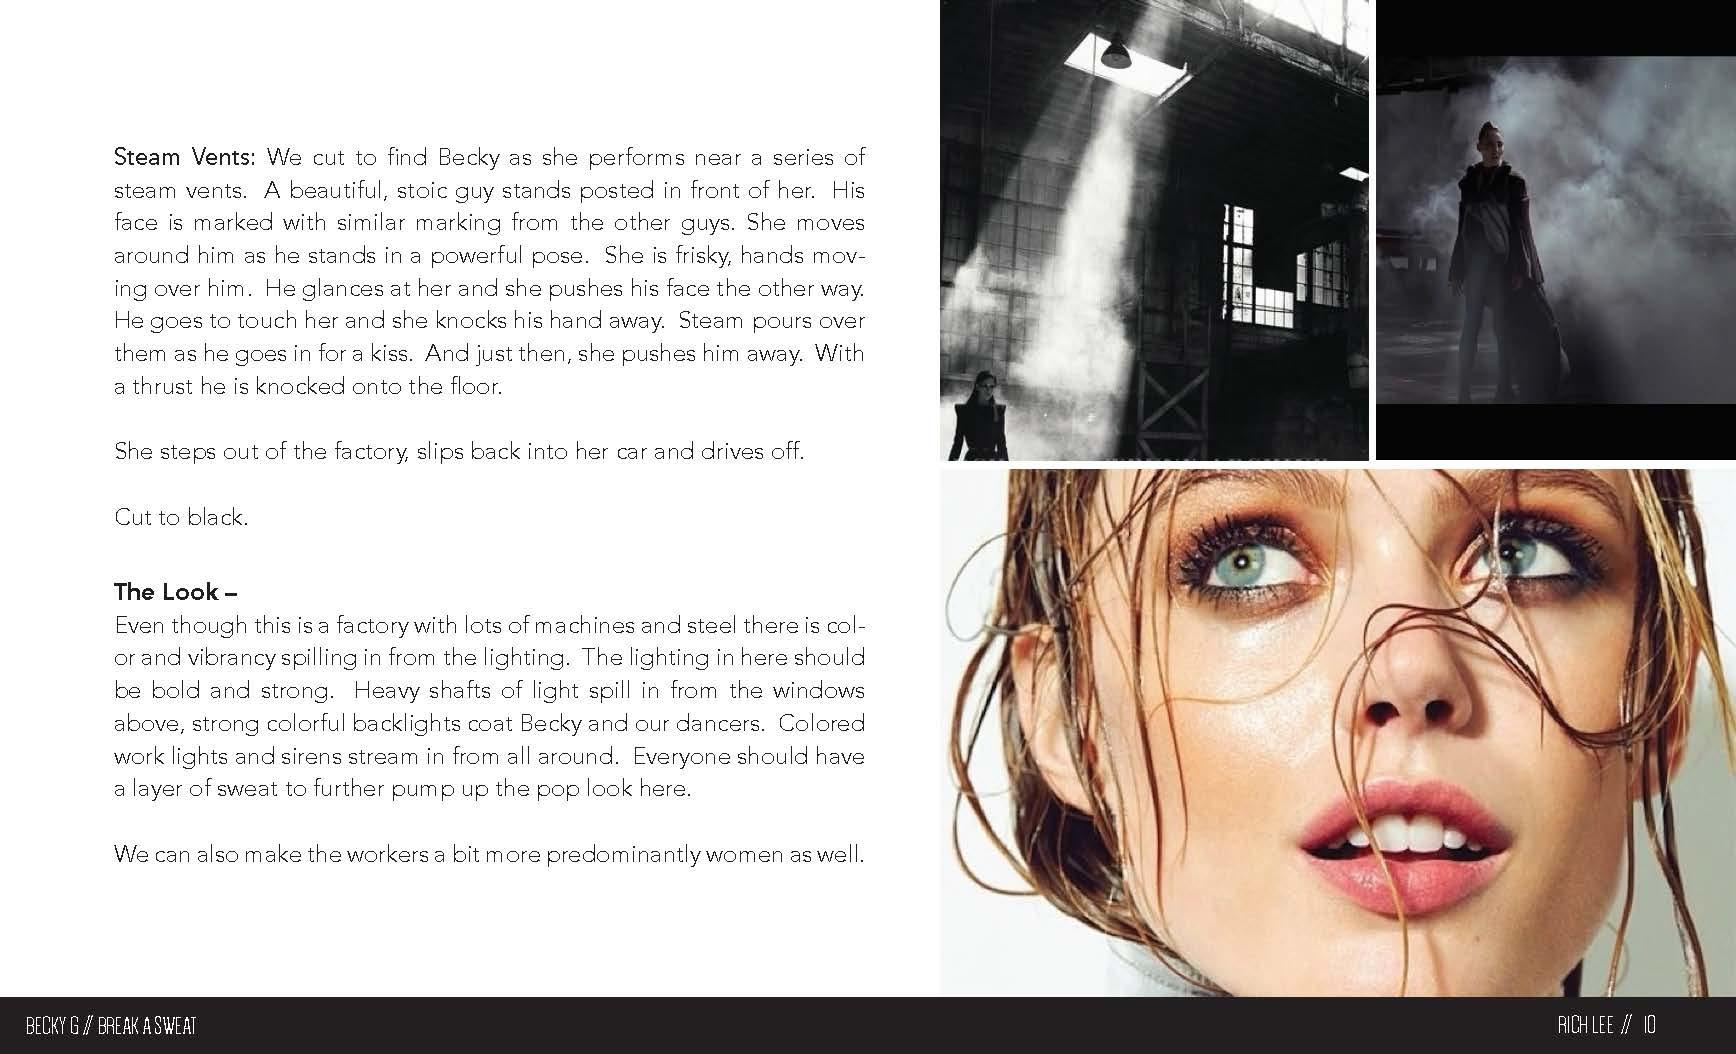 BeckyG_RL_091315_Page_10.jpg